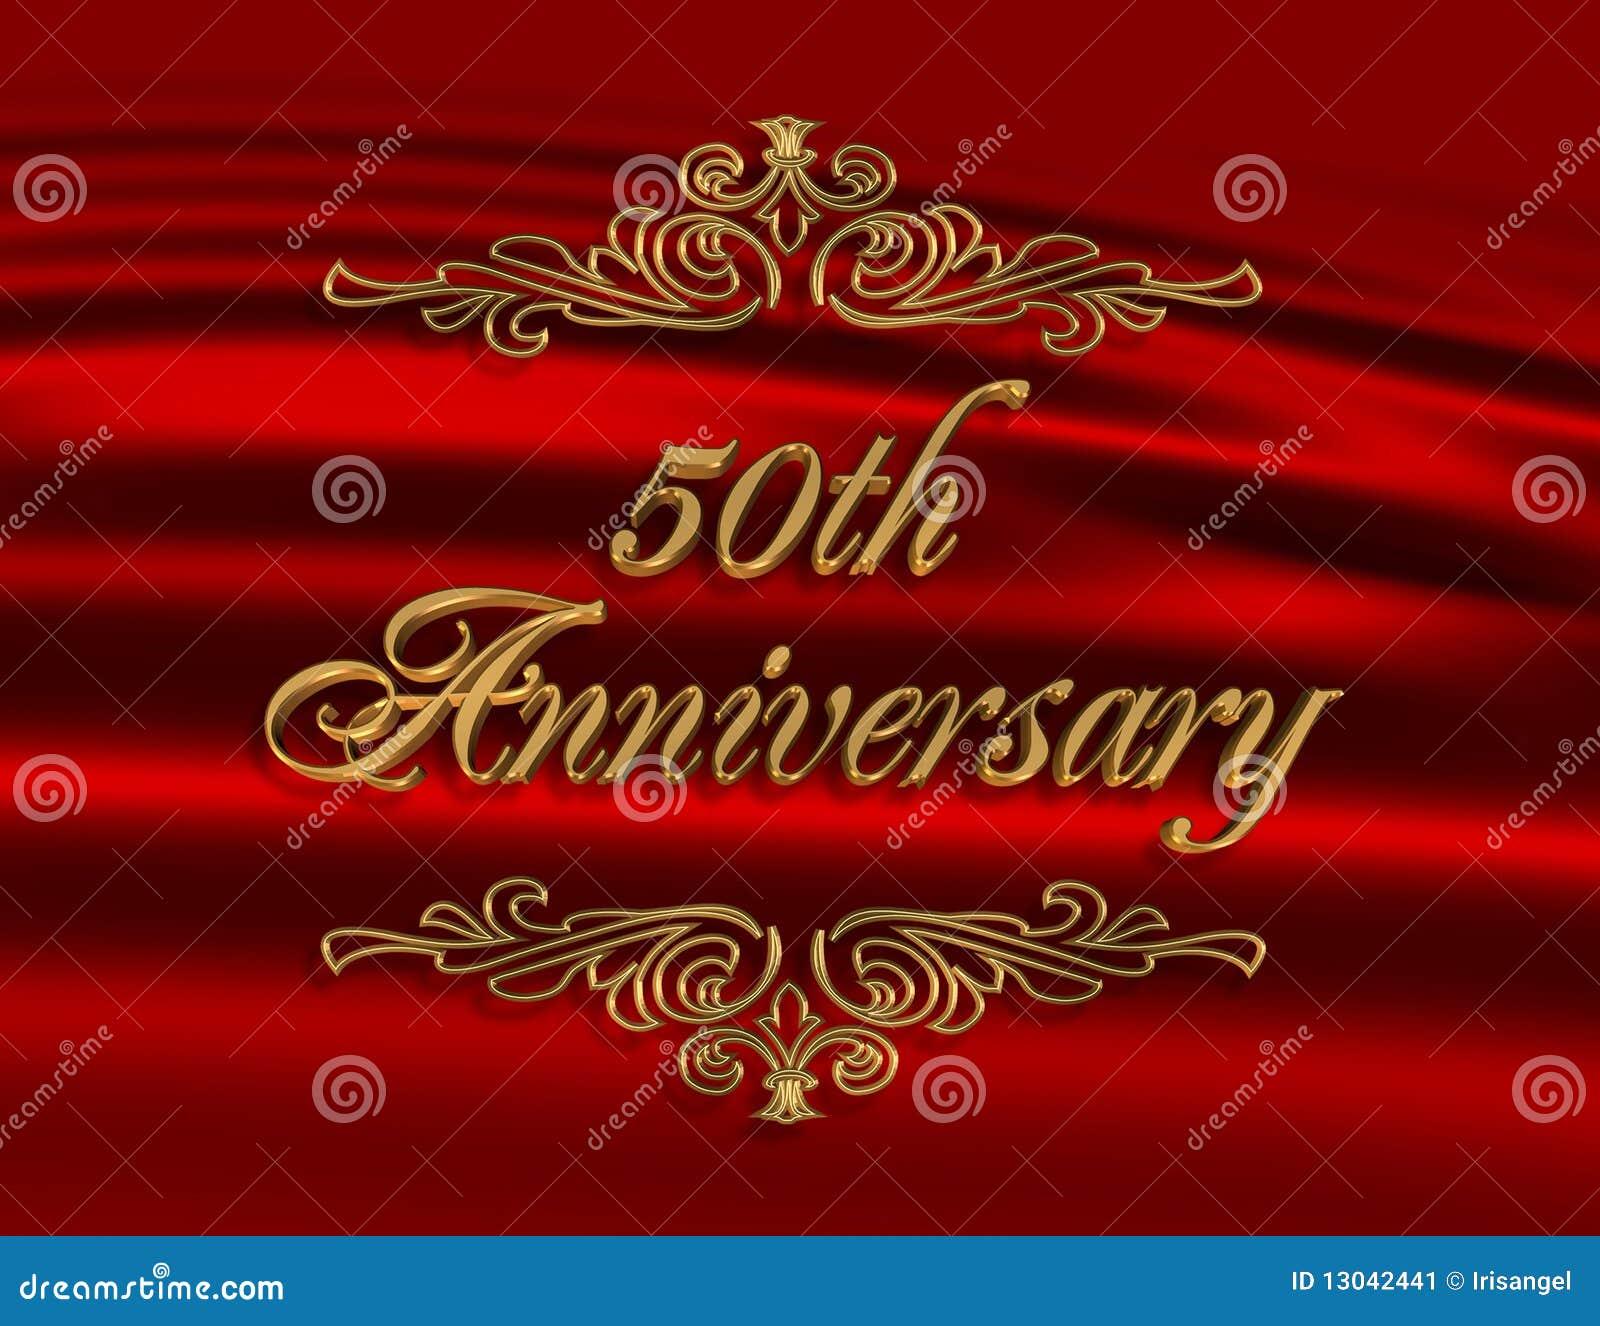 50Th Anniversary Invitation Red Stock Illustration - Illustration of ...